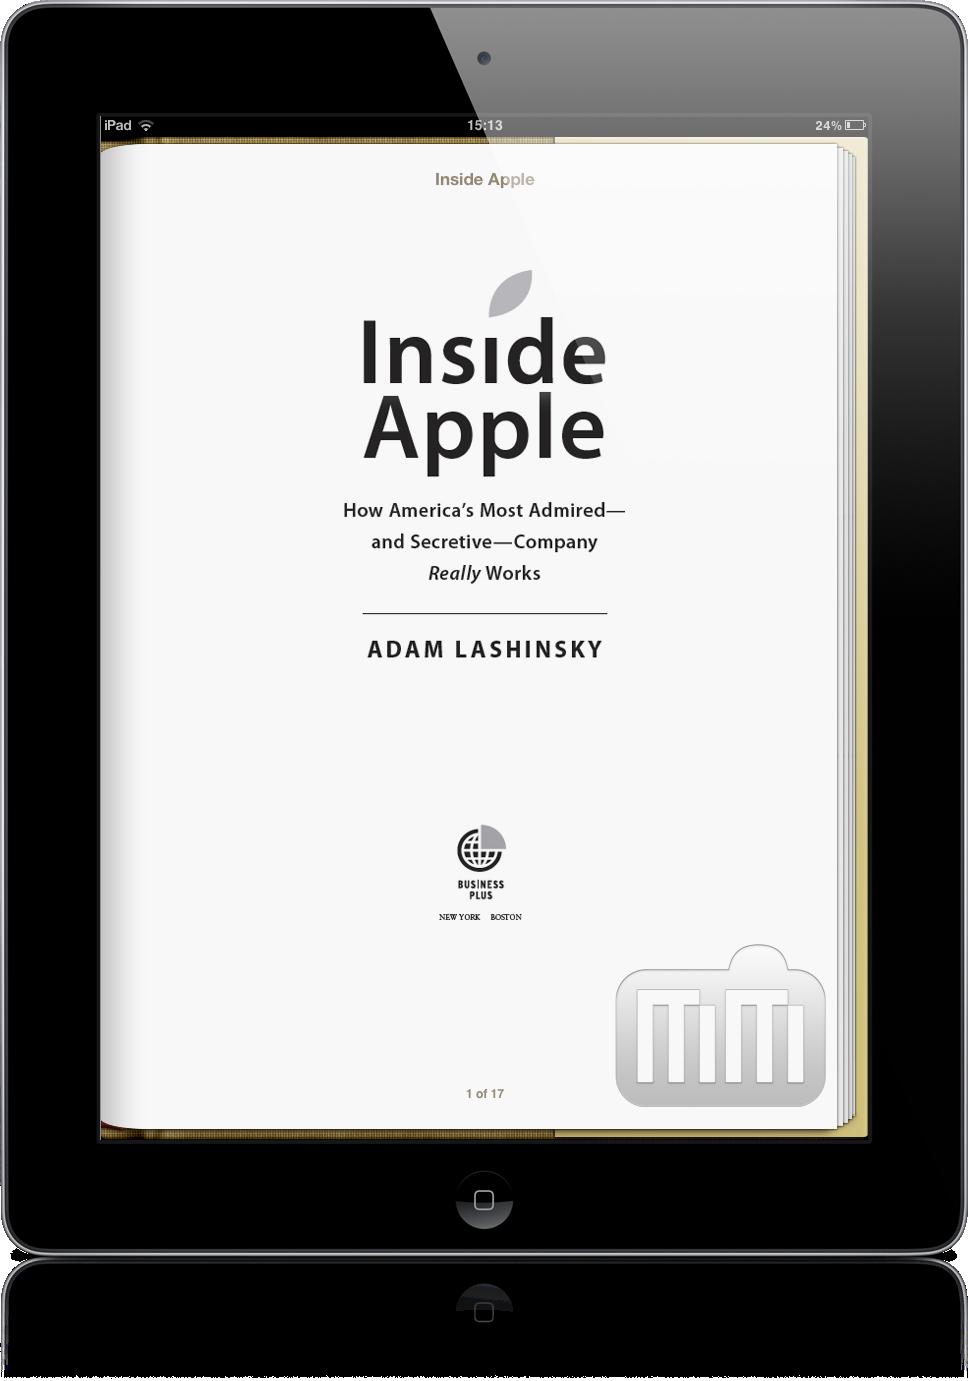 Livro Inside Apple no iPad